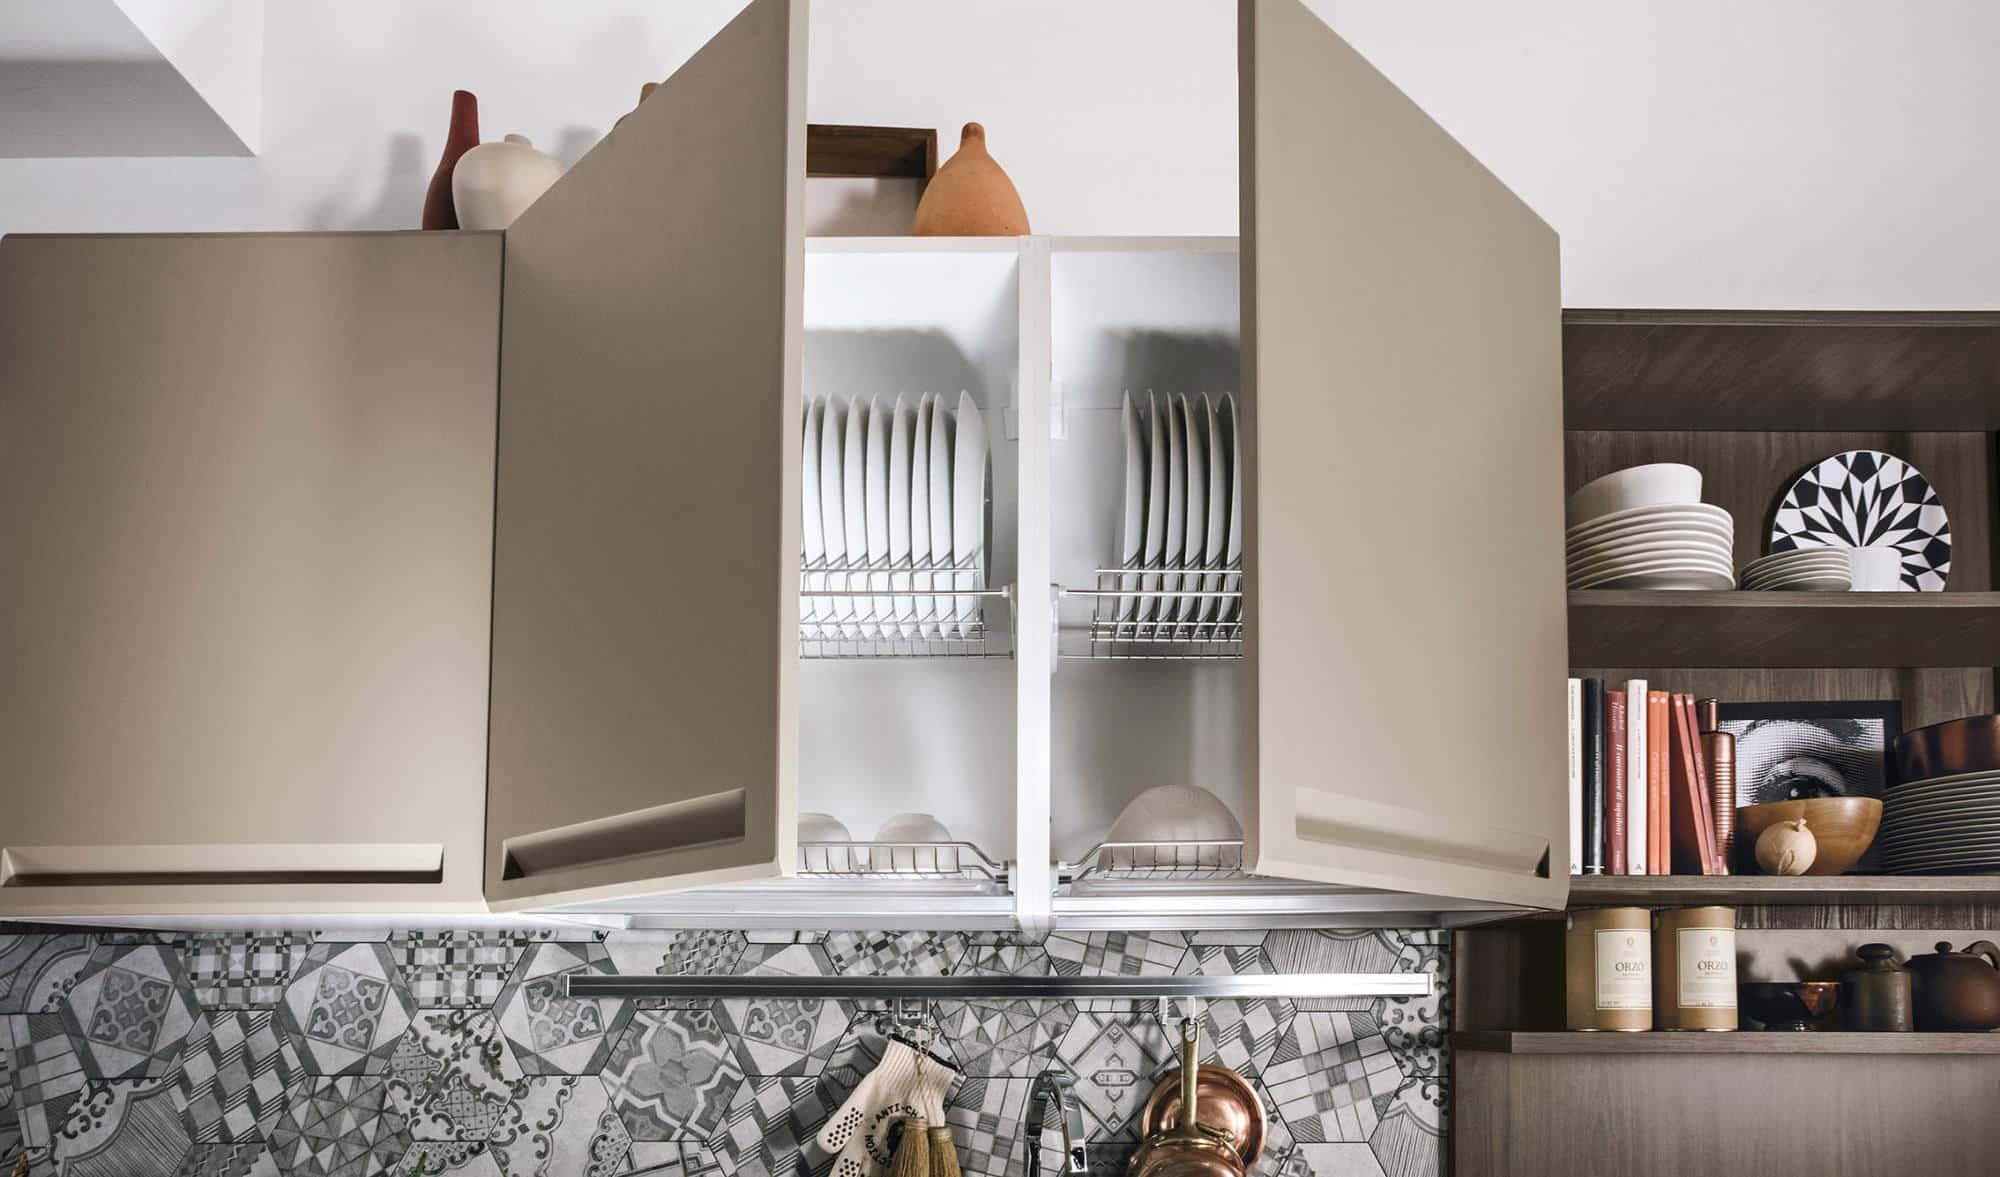 Isla κουζινα γκρι-μπεζ χρωματισμο πολυμερικο με ενσωματωμενη λαβη και ρετρο υφος λεπτομερειες